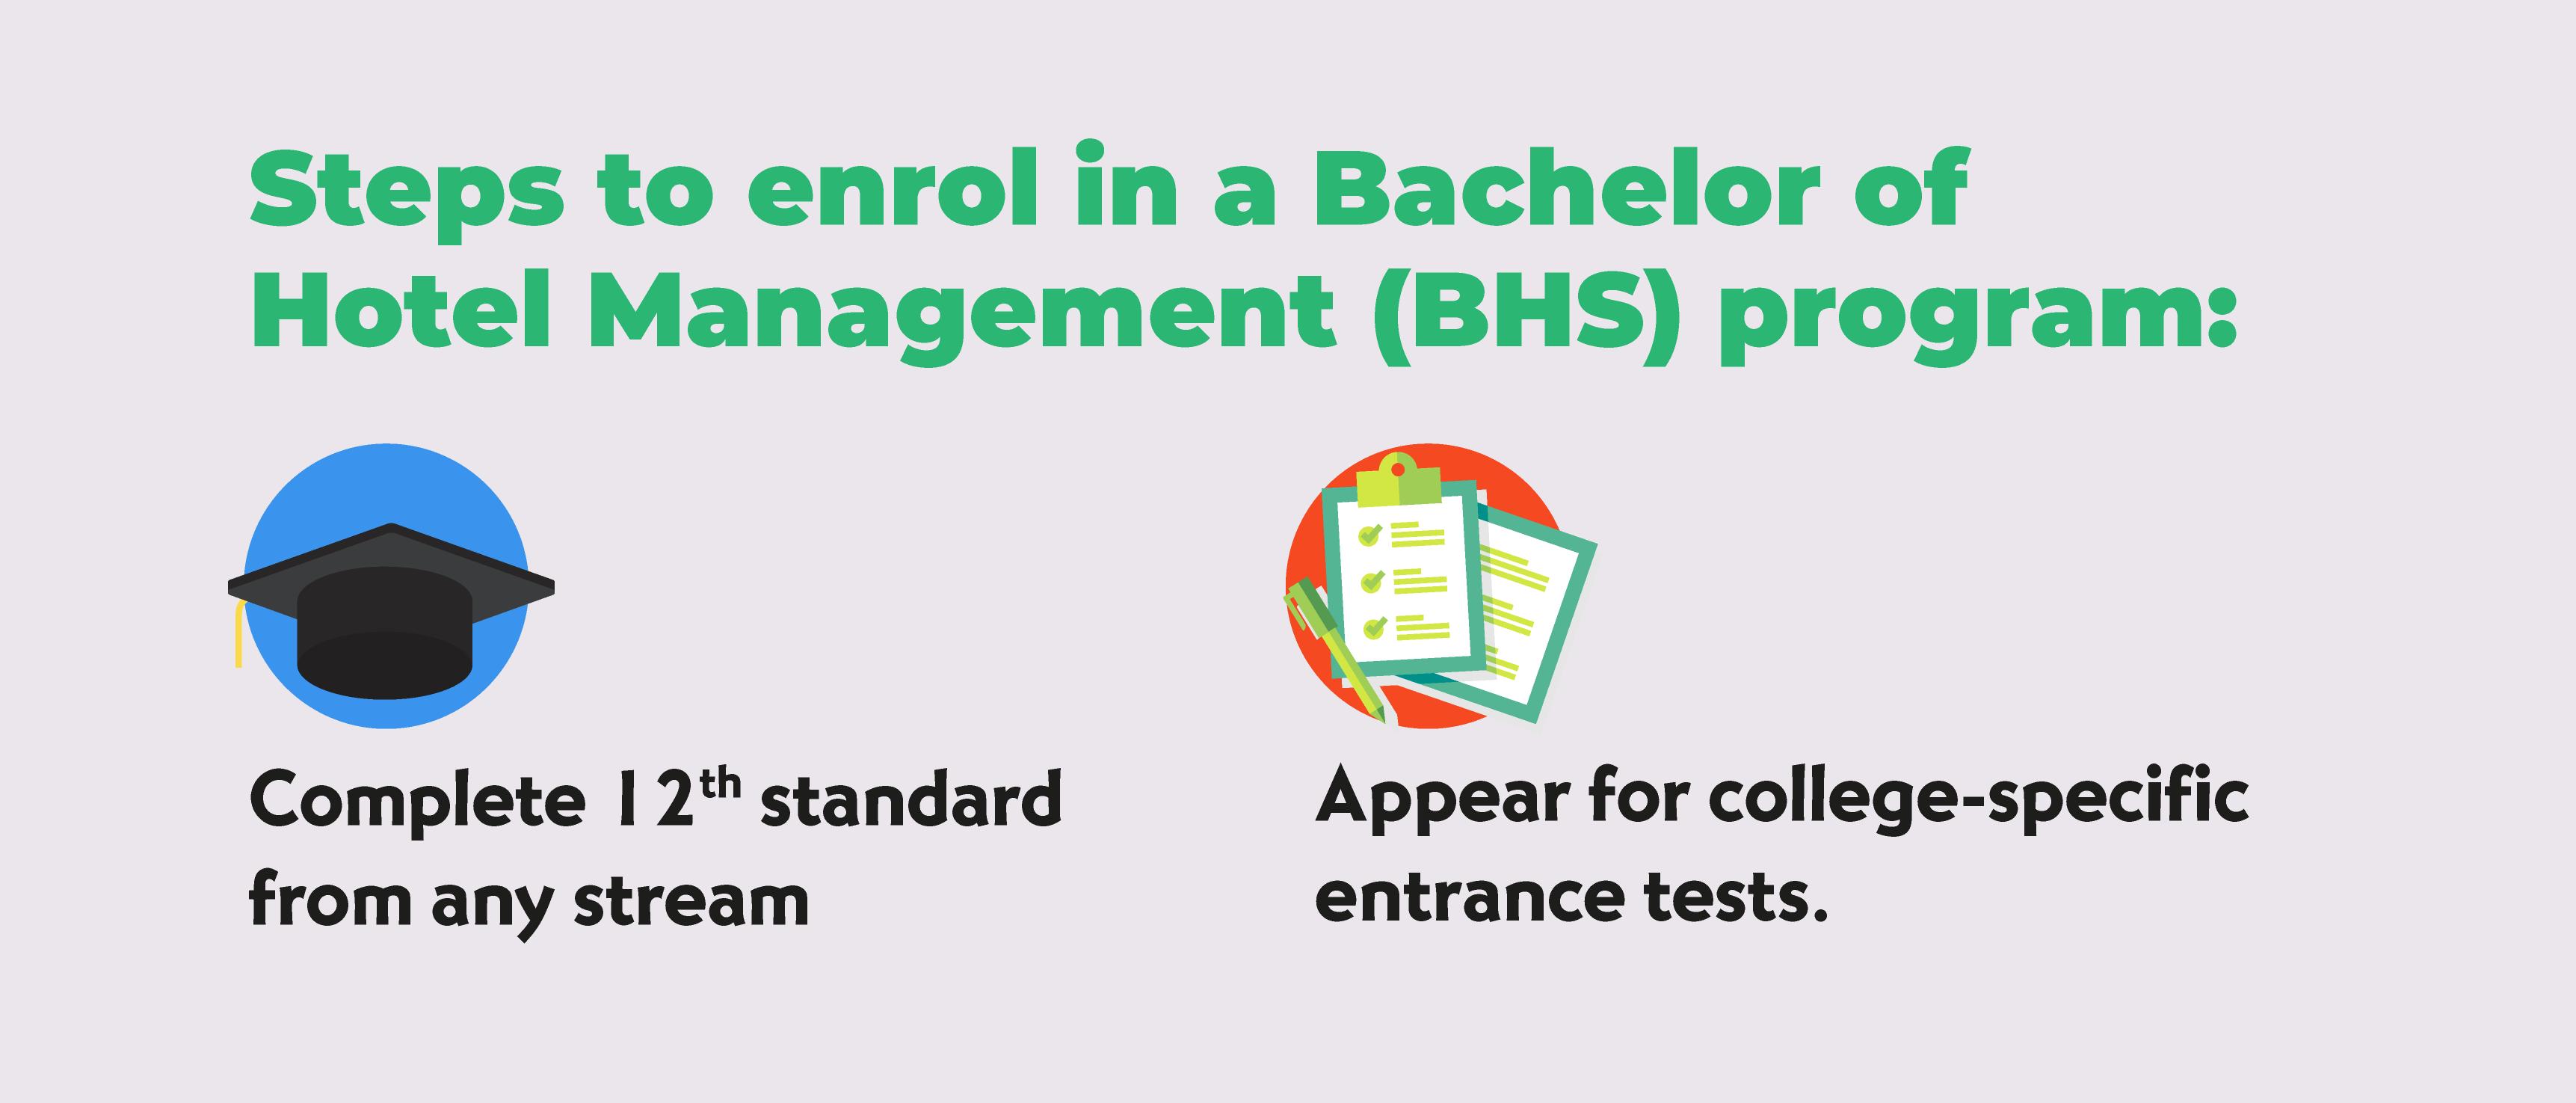 Steps to enrol in BHS program